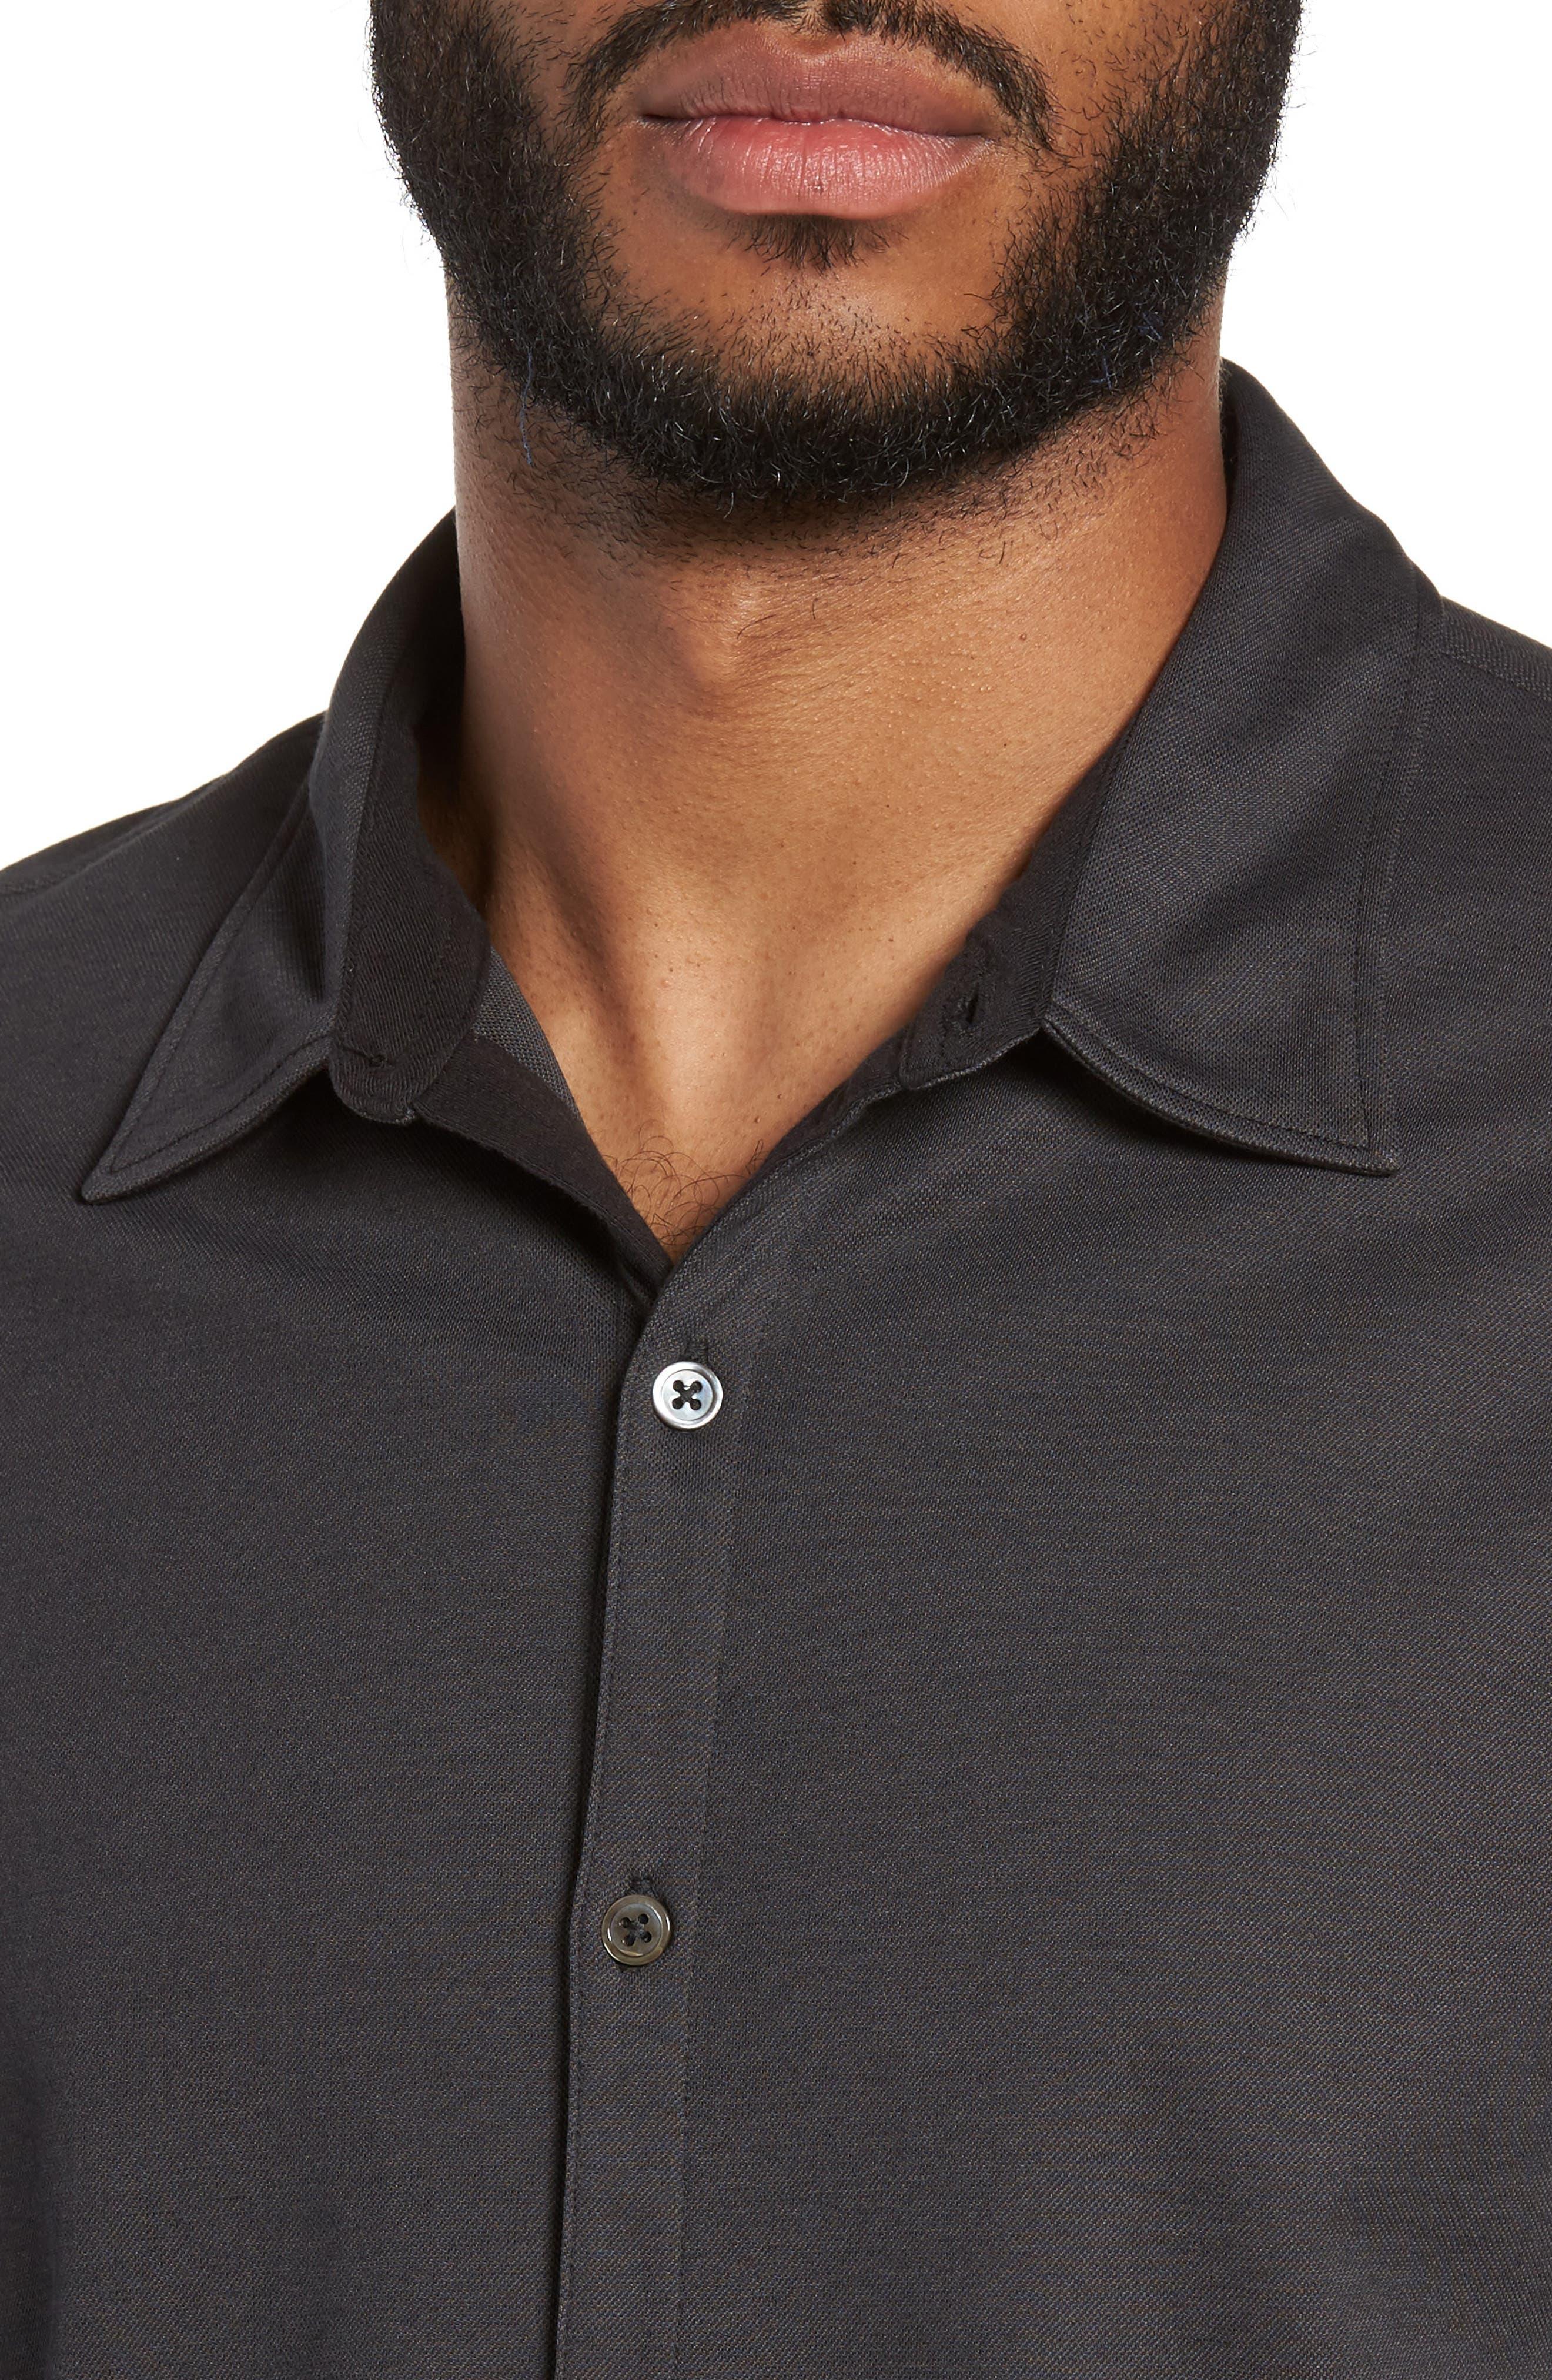 Glacier Knit Sport Shirt,                             Alternate thumbnail 4, color,                             Black